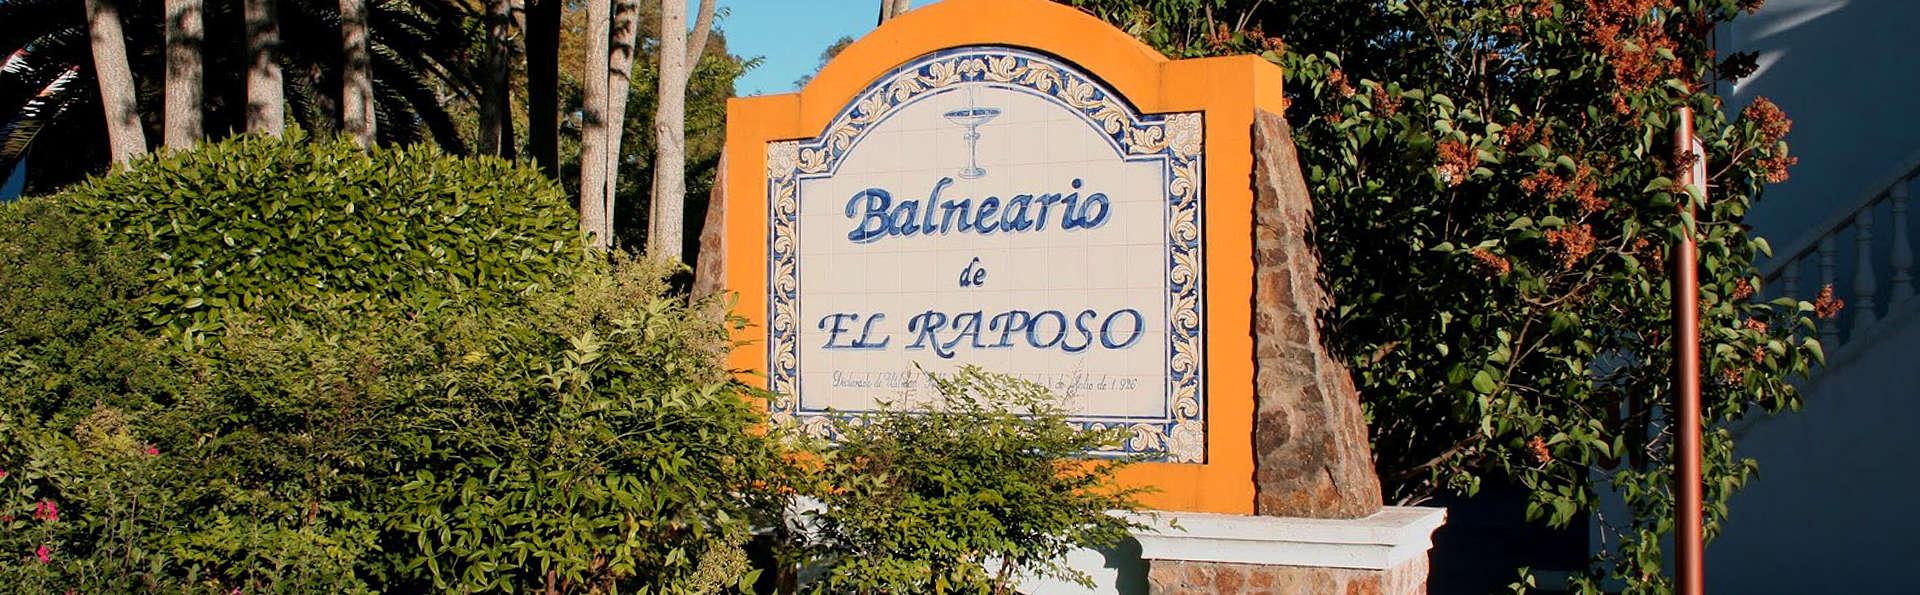 Hotel Balneario El Raposo - EDIT_Exterior1.jpg